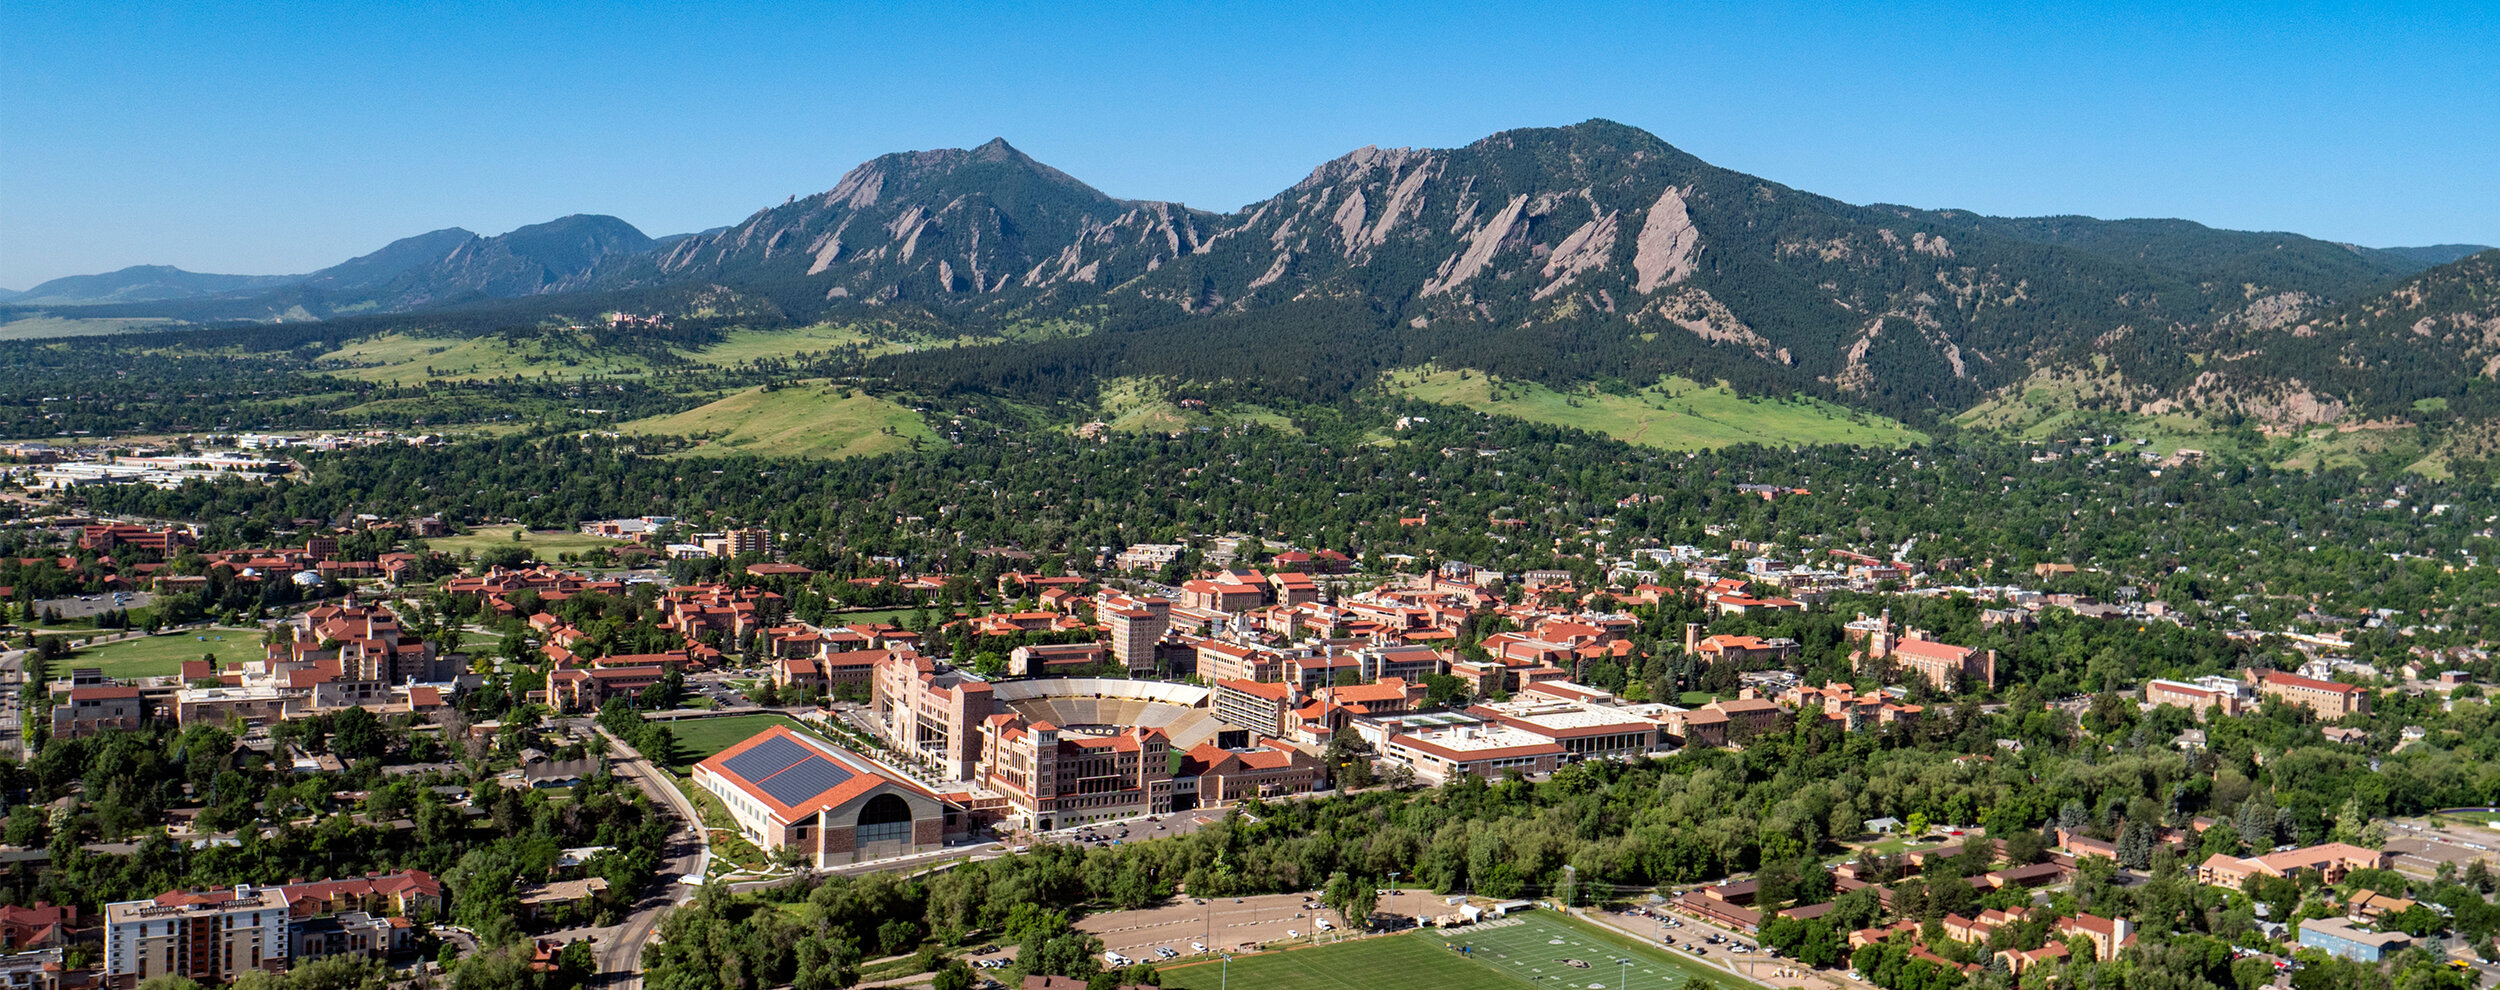 The University of Colorado Boulder (nicknamed CU Boulder)